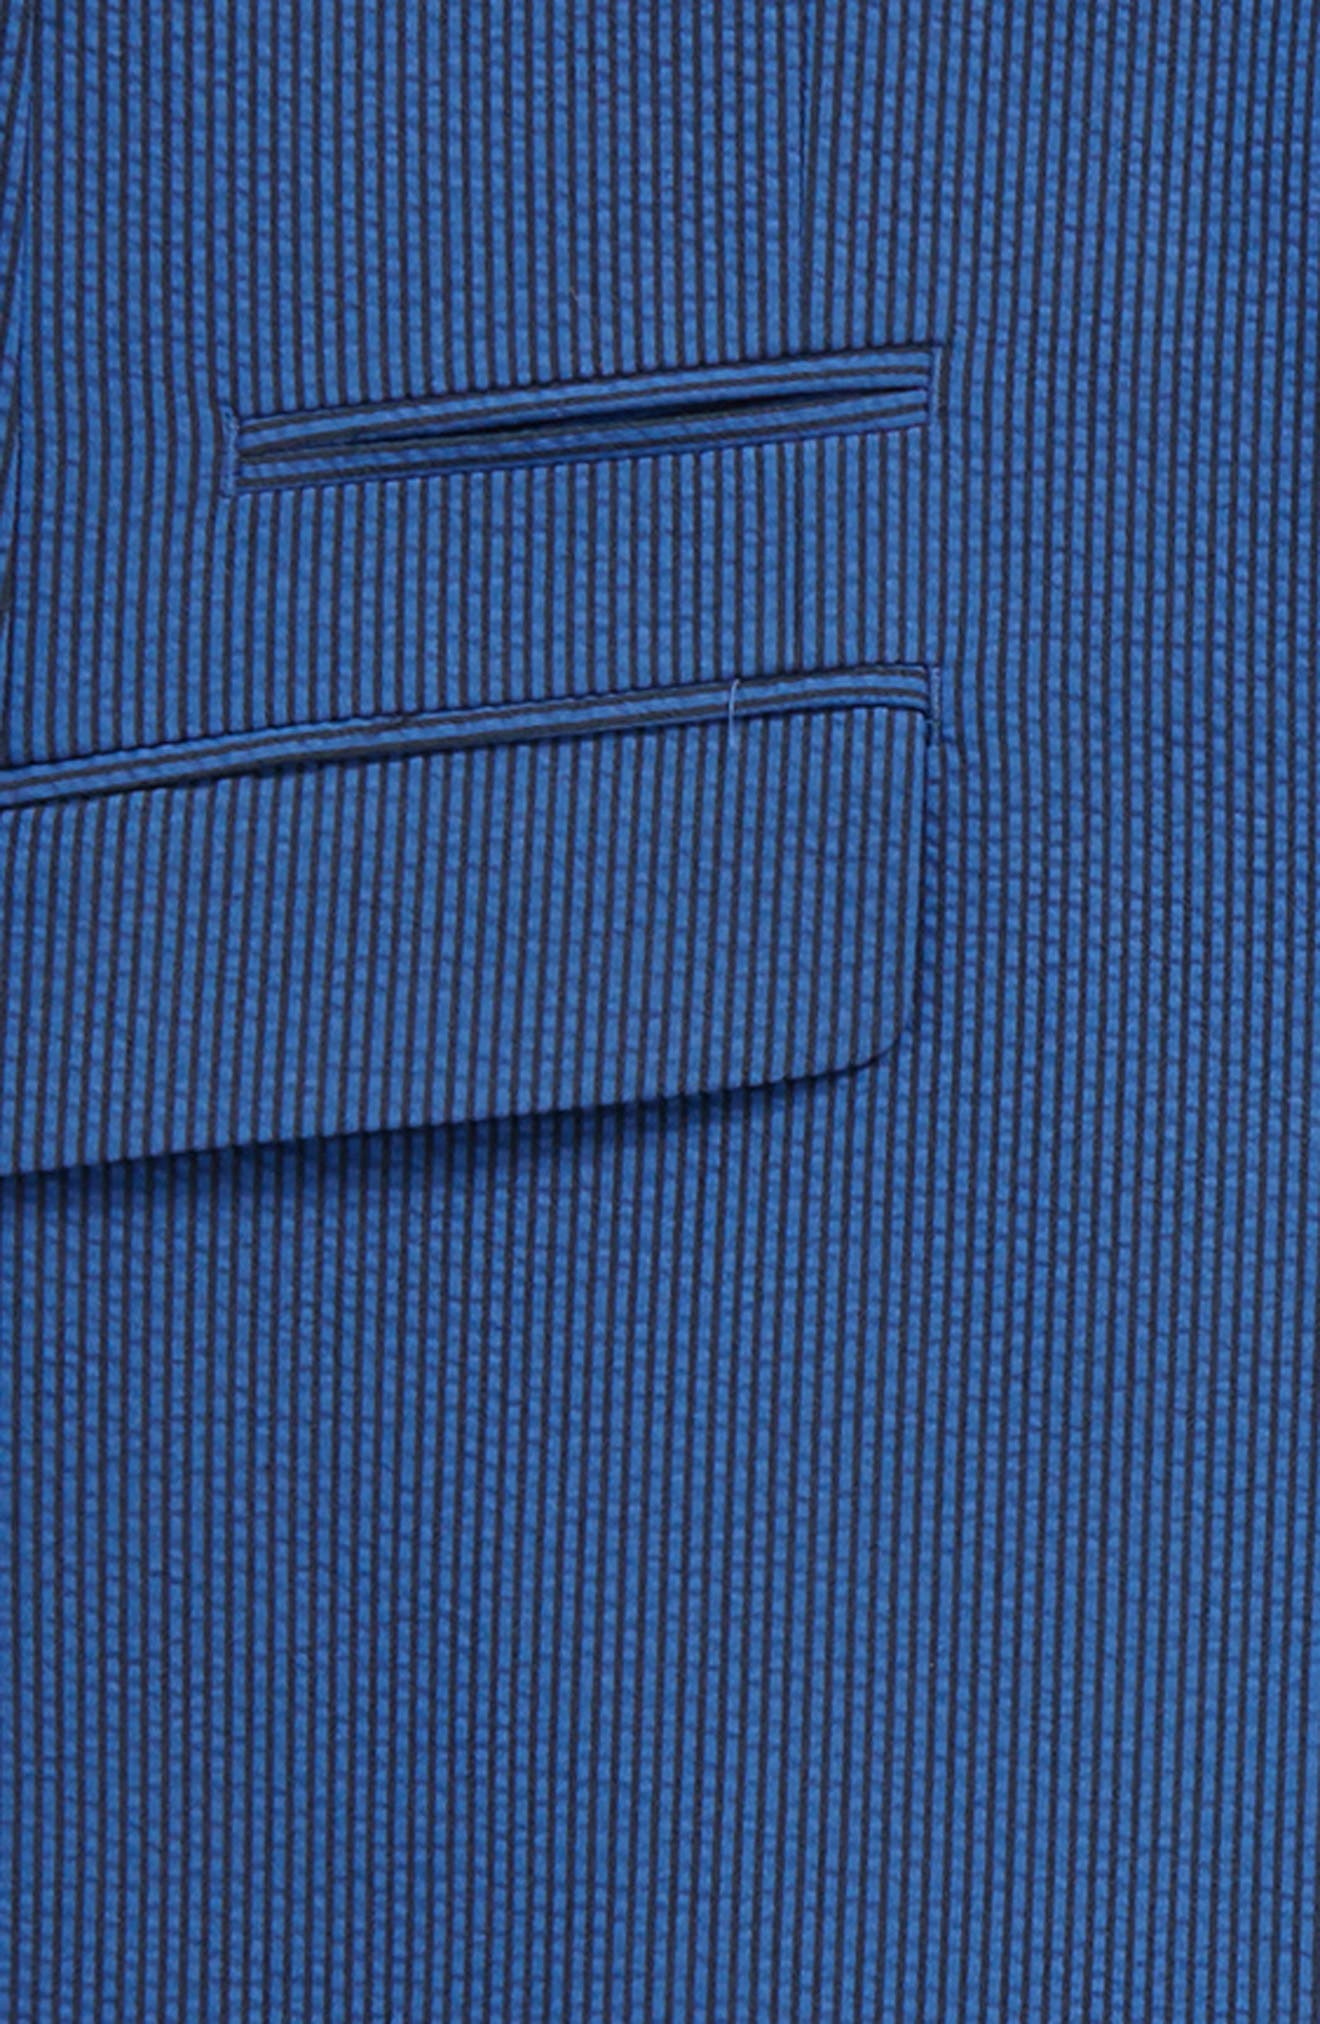 Skinny Fit Suit,                             Alternate thumbnail 2, color,                             Medium Blue